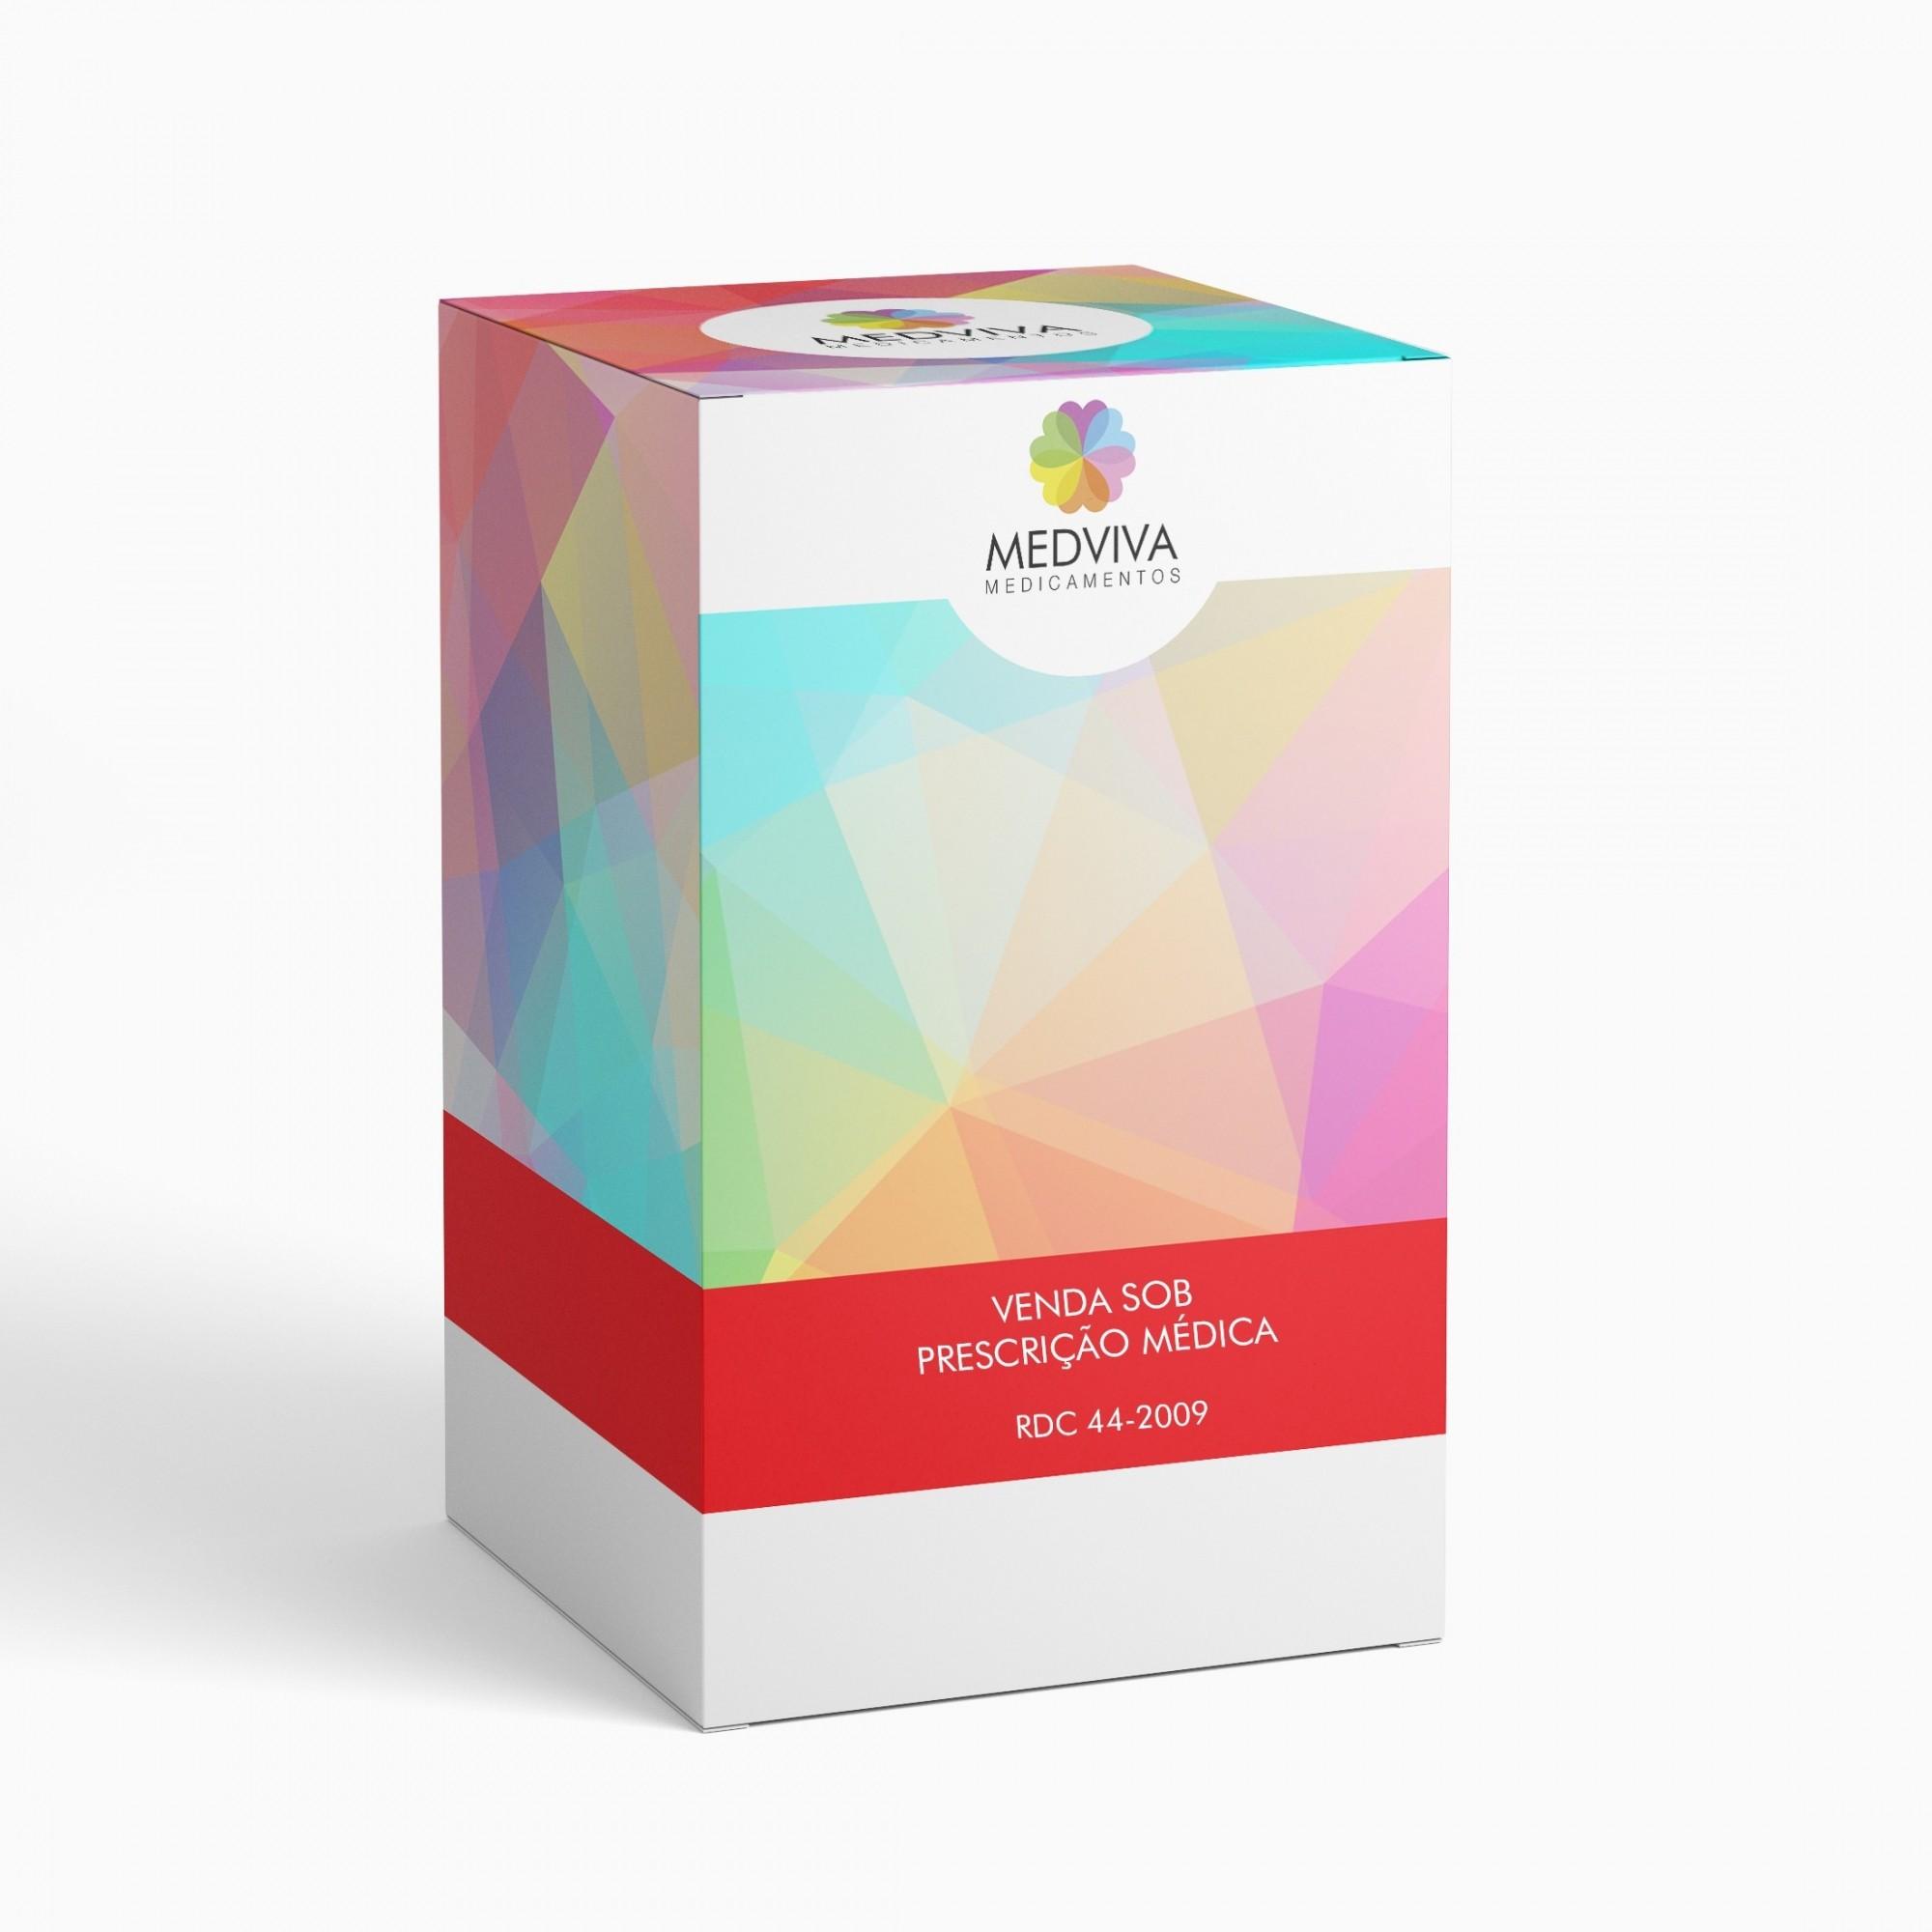 Rosuvastatina Cálcica 10mg 30 Comprimidos